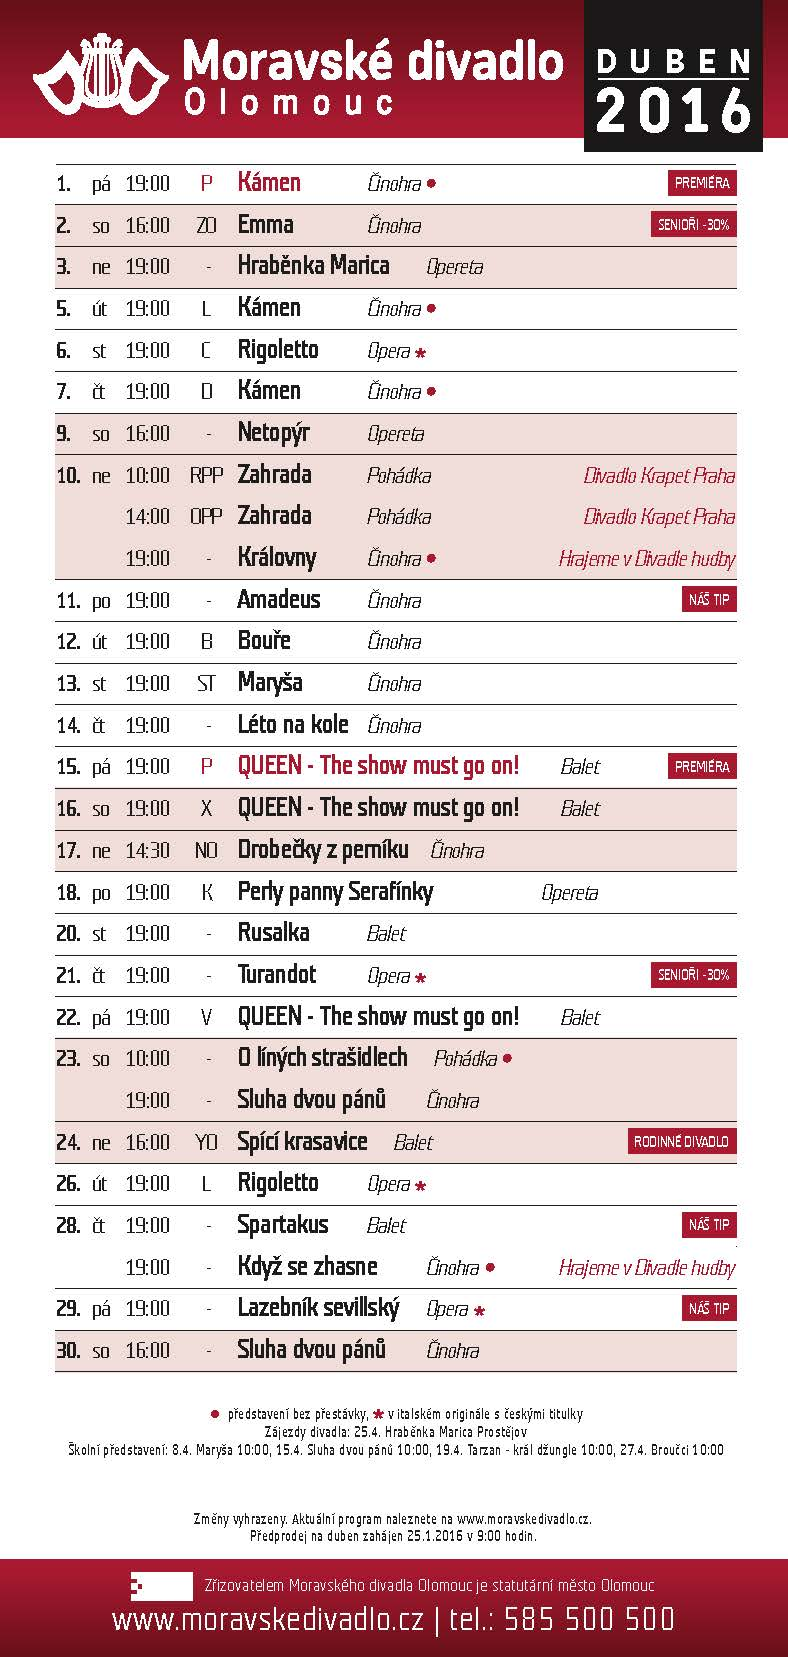 MDO infoletak DUBEN 2016 PDF_Stránka_1